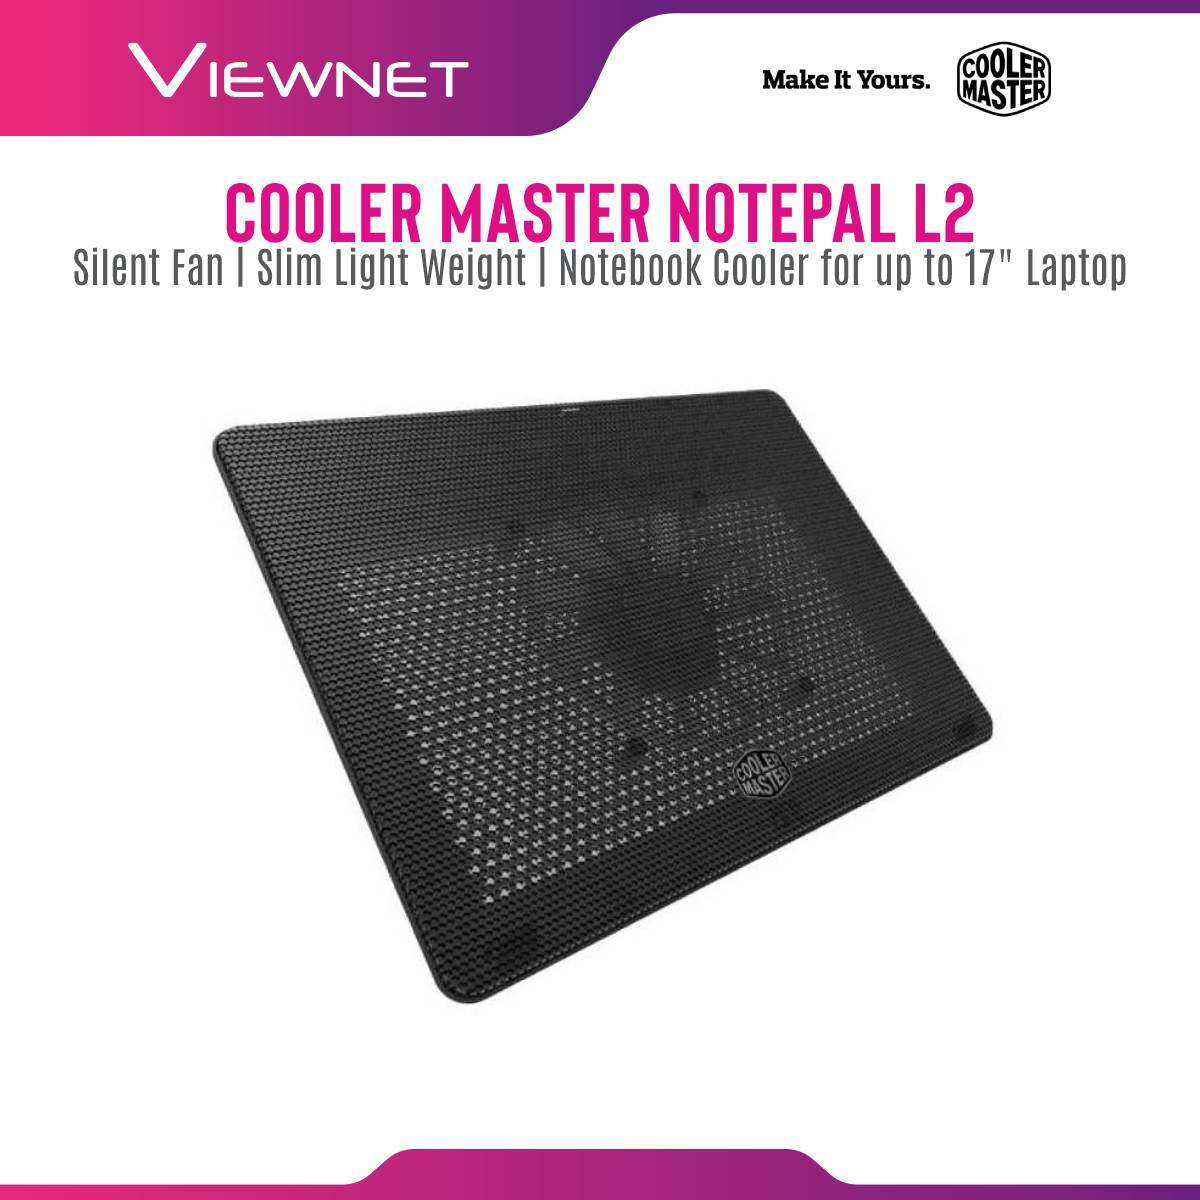 Cooler Master Notepal L2 160mm Blue LED Silent Fan Slim Light Weight Portable Ergonomic Mesh USB 2.0 Notebook Cooler for up to 17